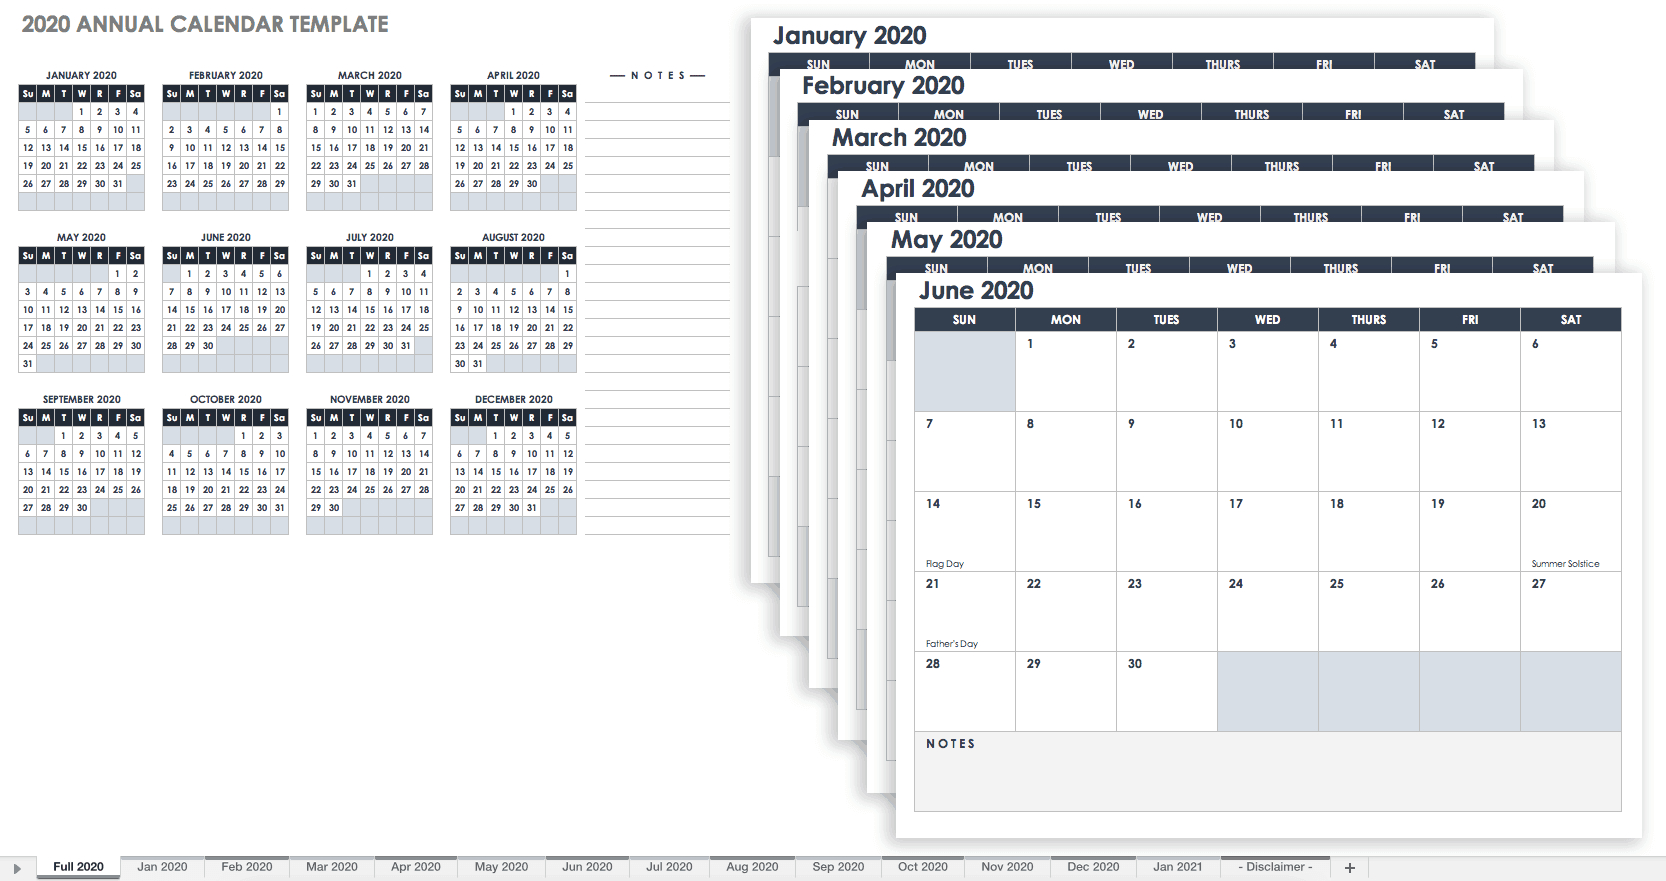 Free Excel Calendar Templates Free 12 Month Calendar Template For Expiry Dates